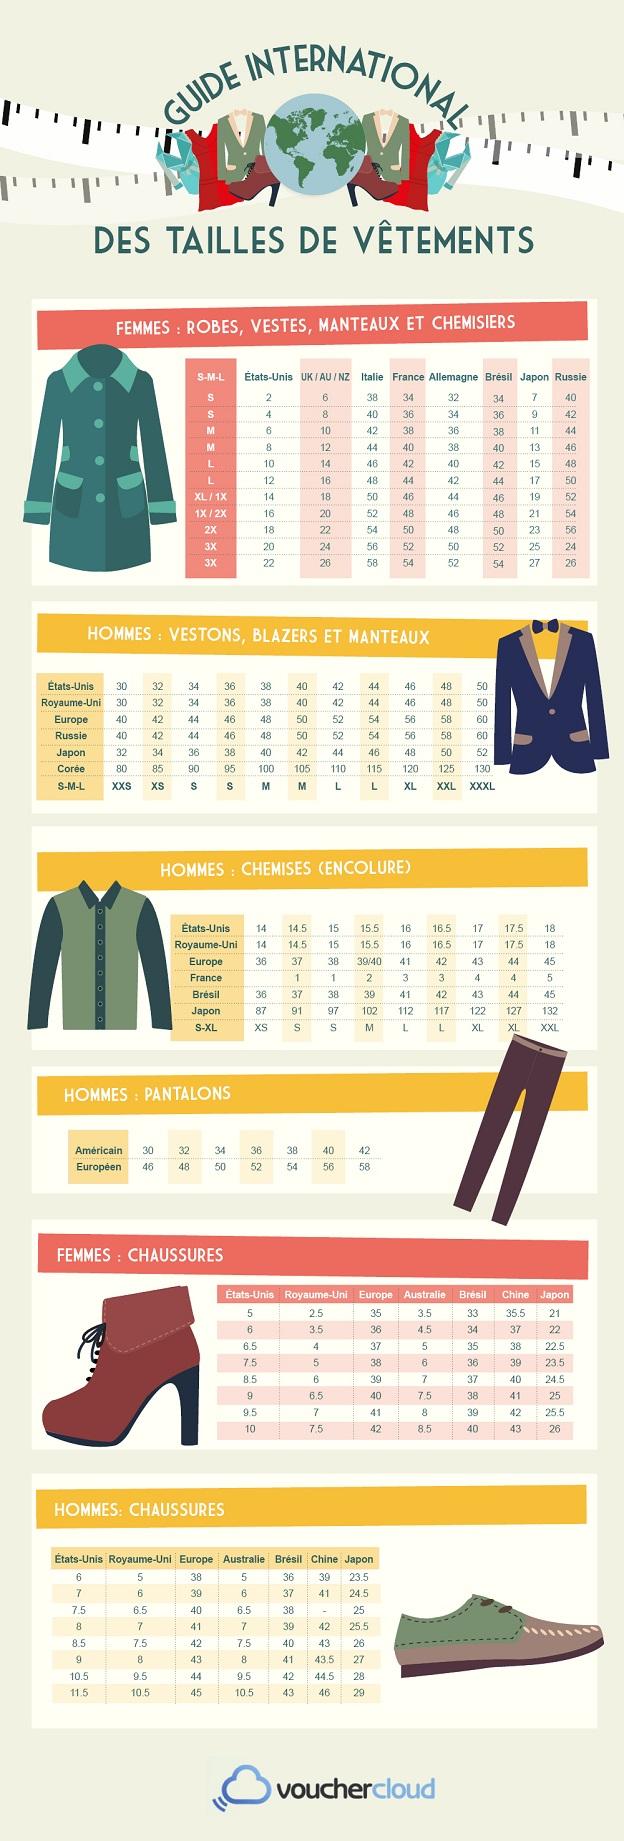 guide international des tailles